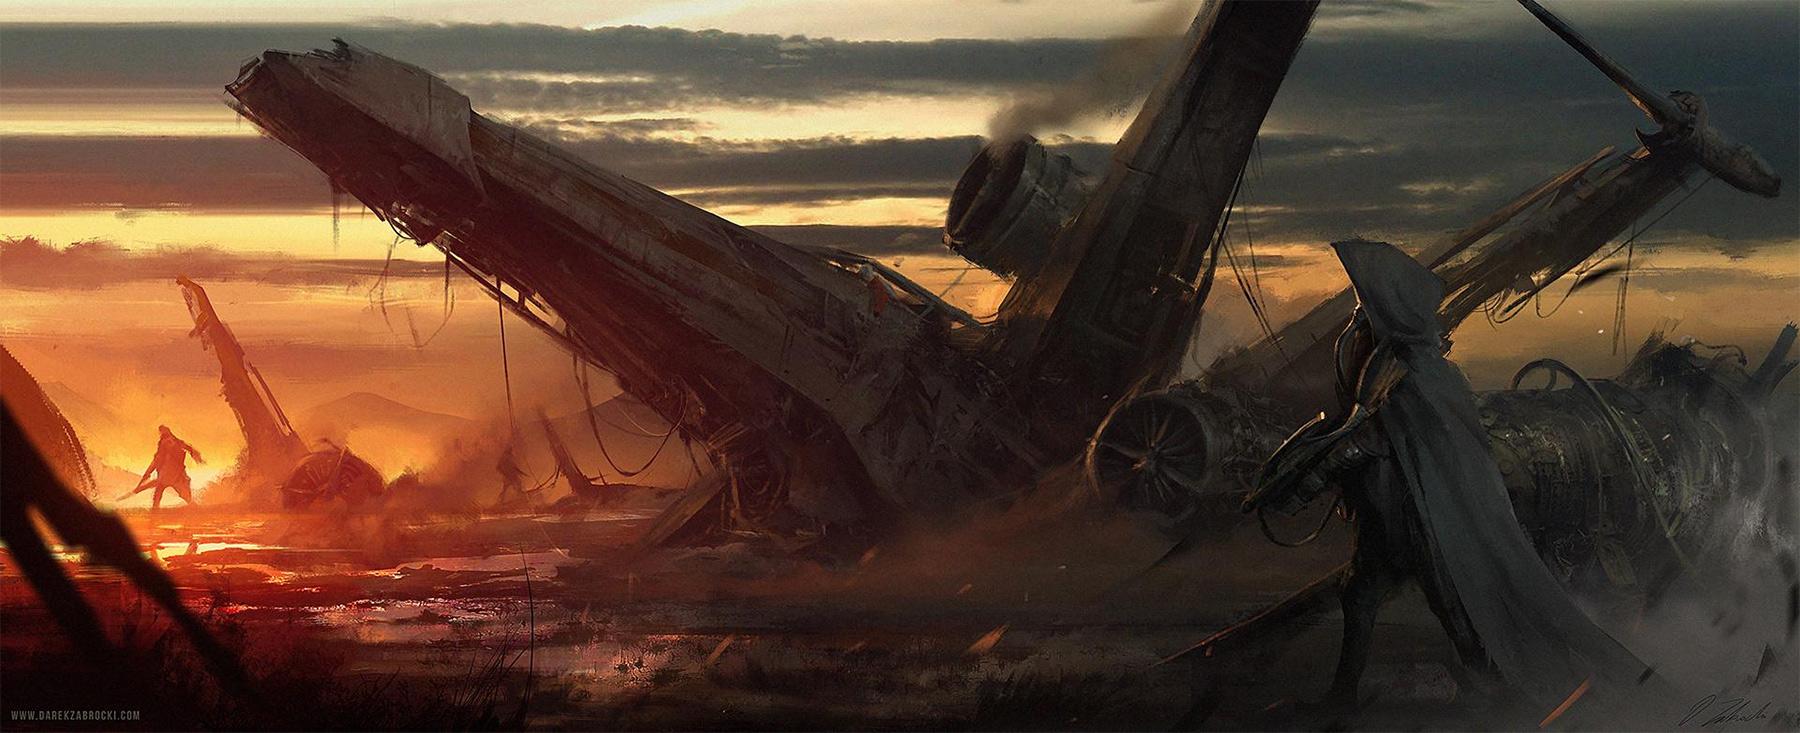 space ship crash - photo #35